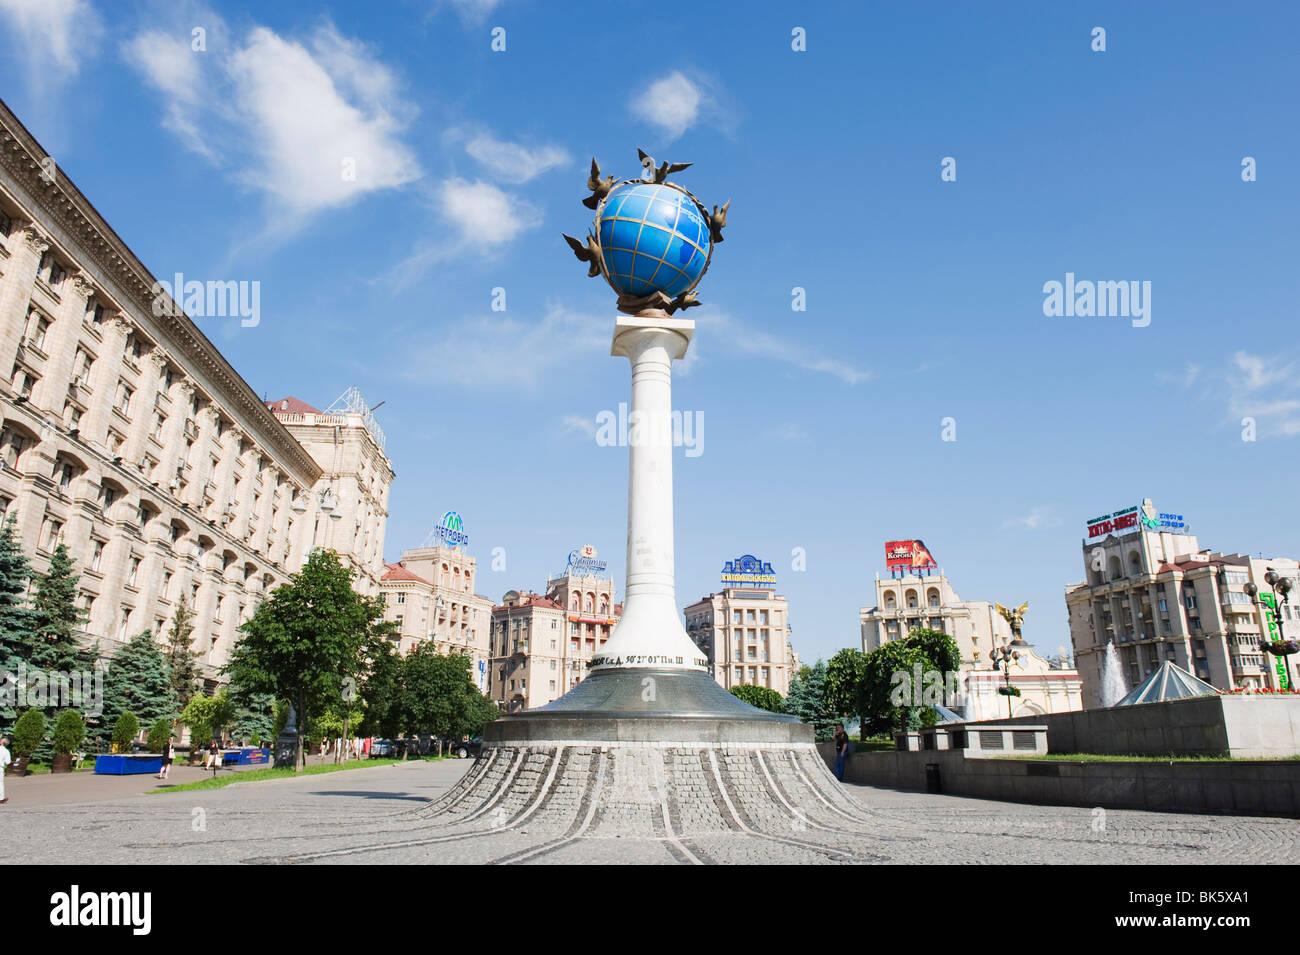 Satue de un globo azul con palomas de la paz, Maidan Nezalezhnosti (Plaza de la Independencia), Kiev, Ucrania, Europa Imagen De Stock